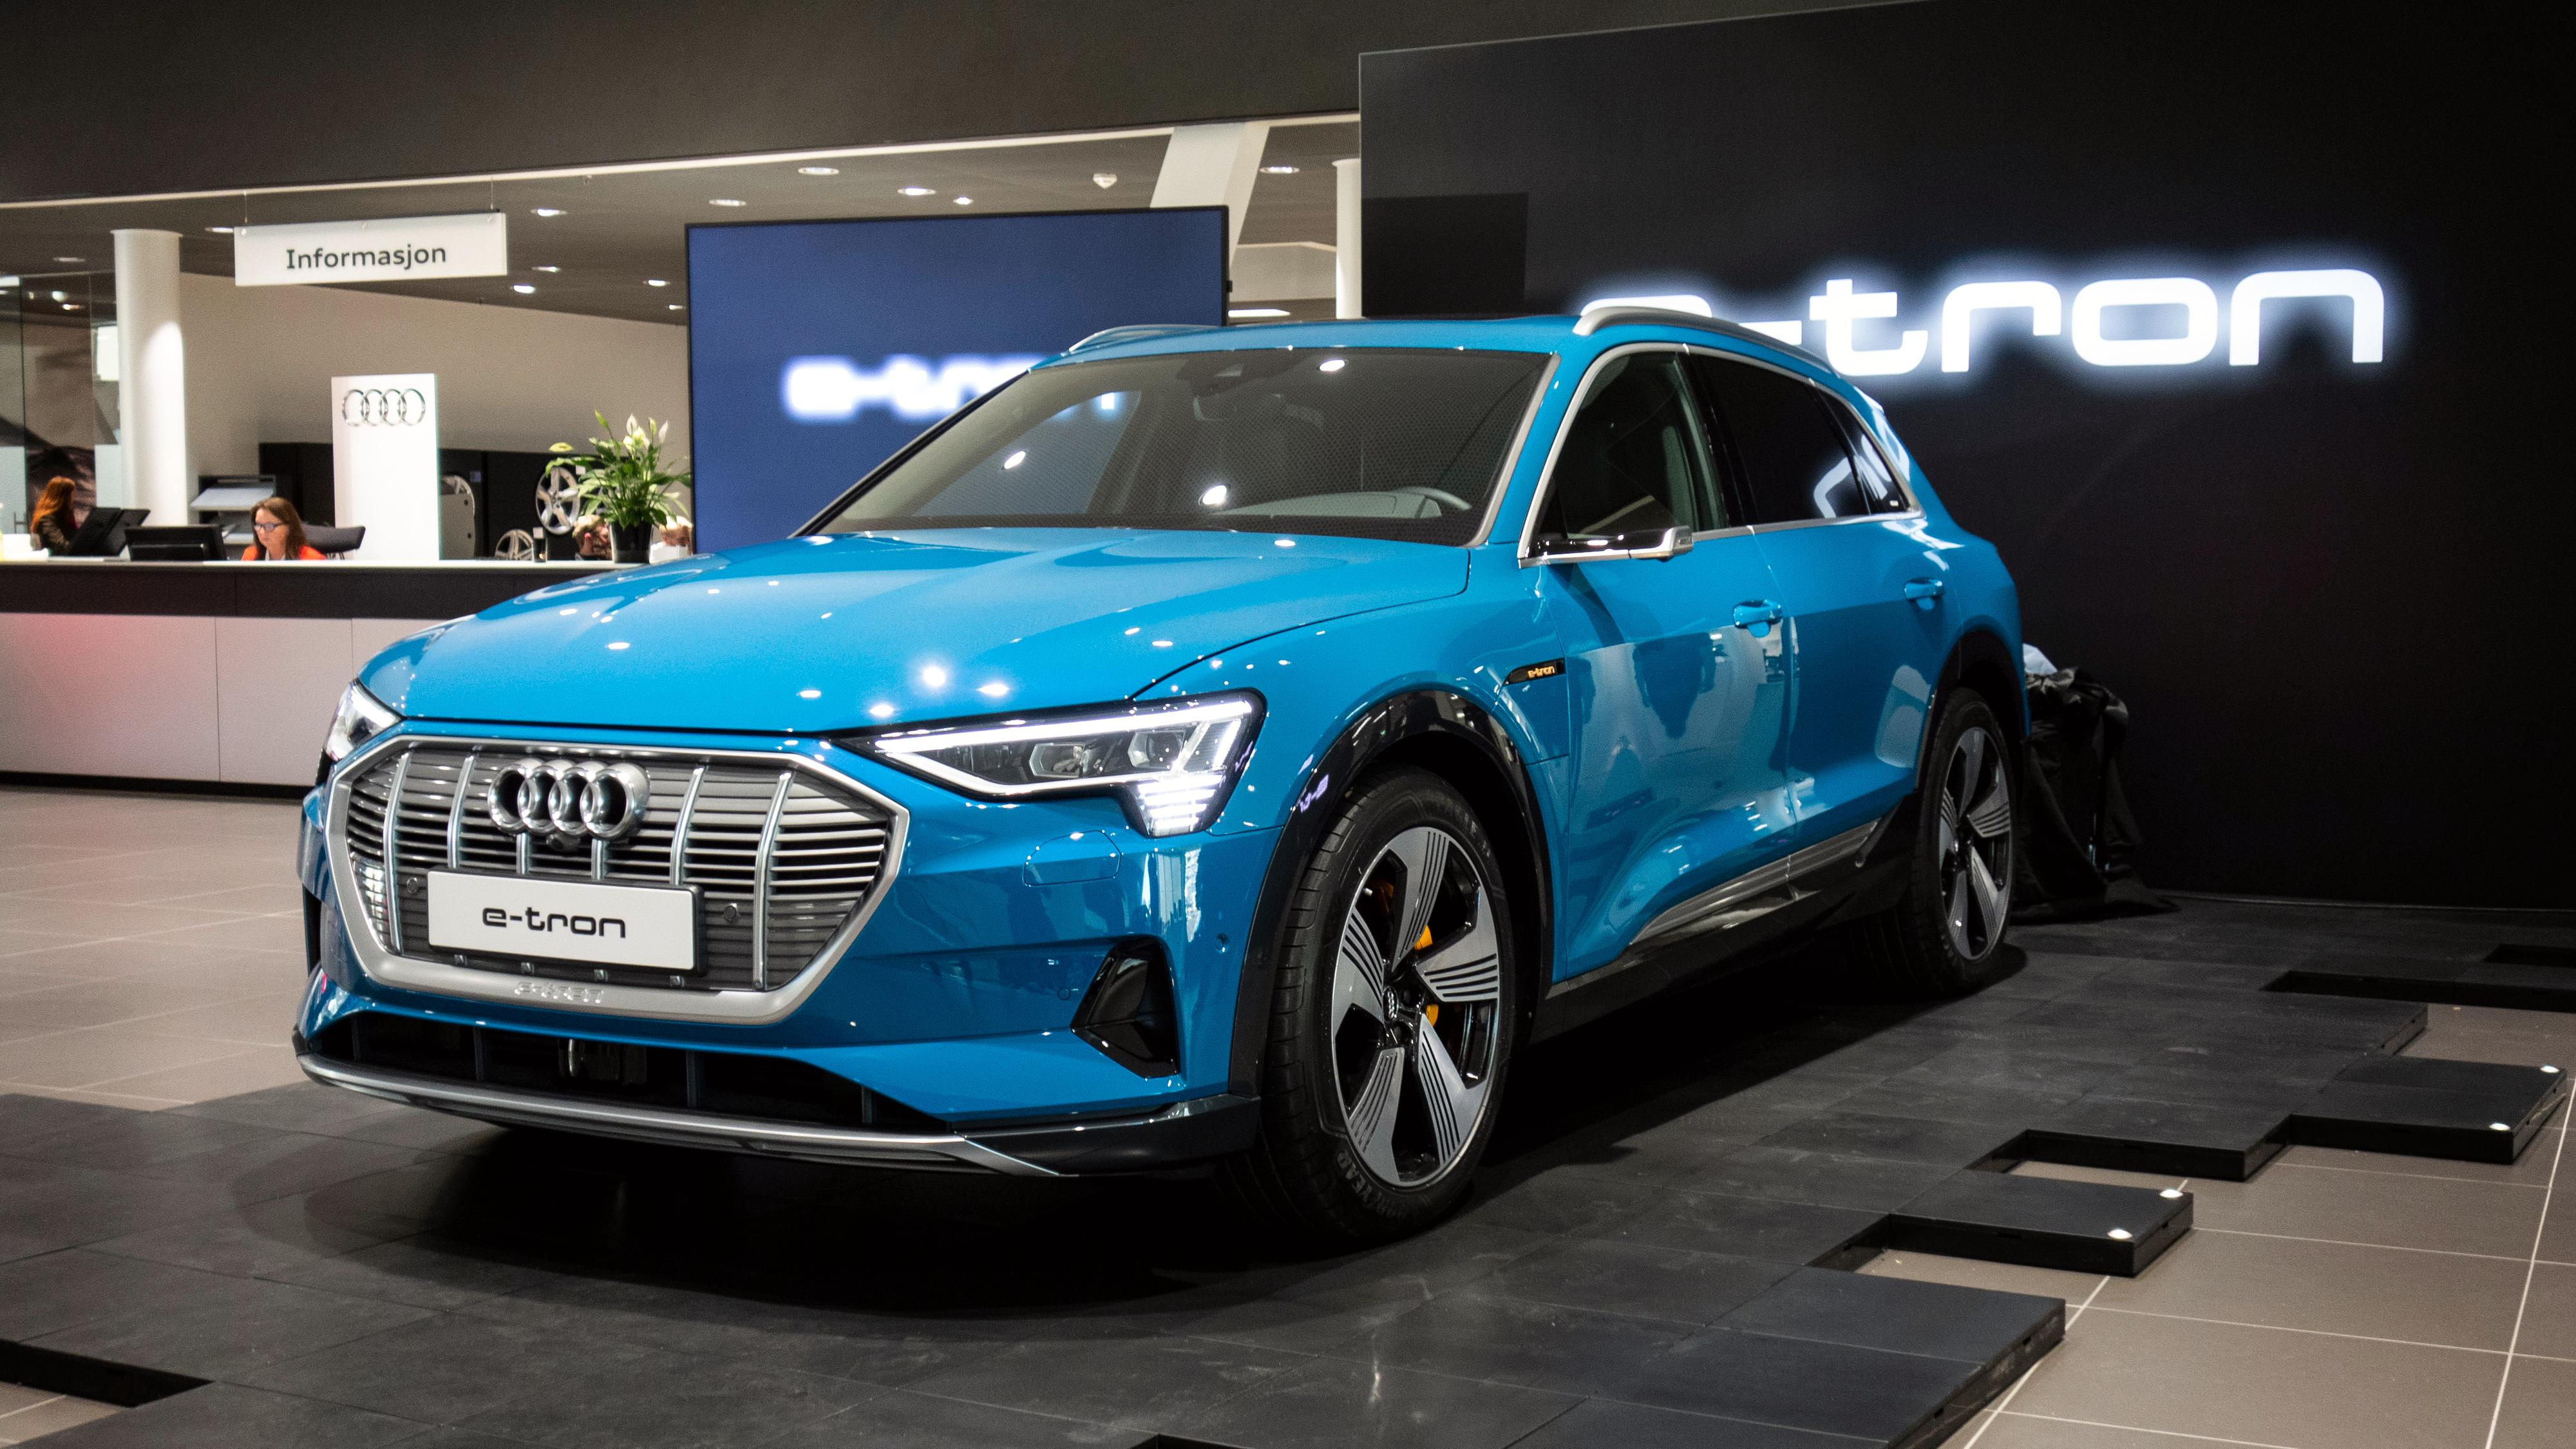 Her er Audi e-tron i Norge